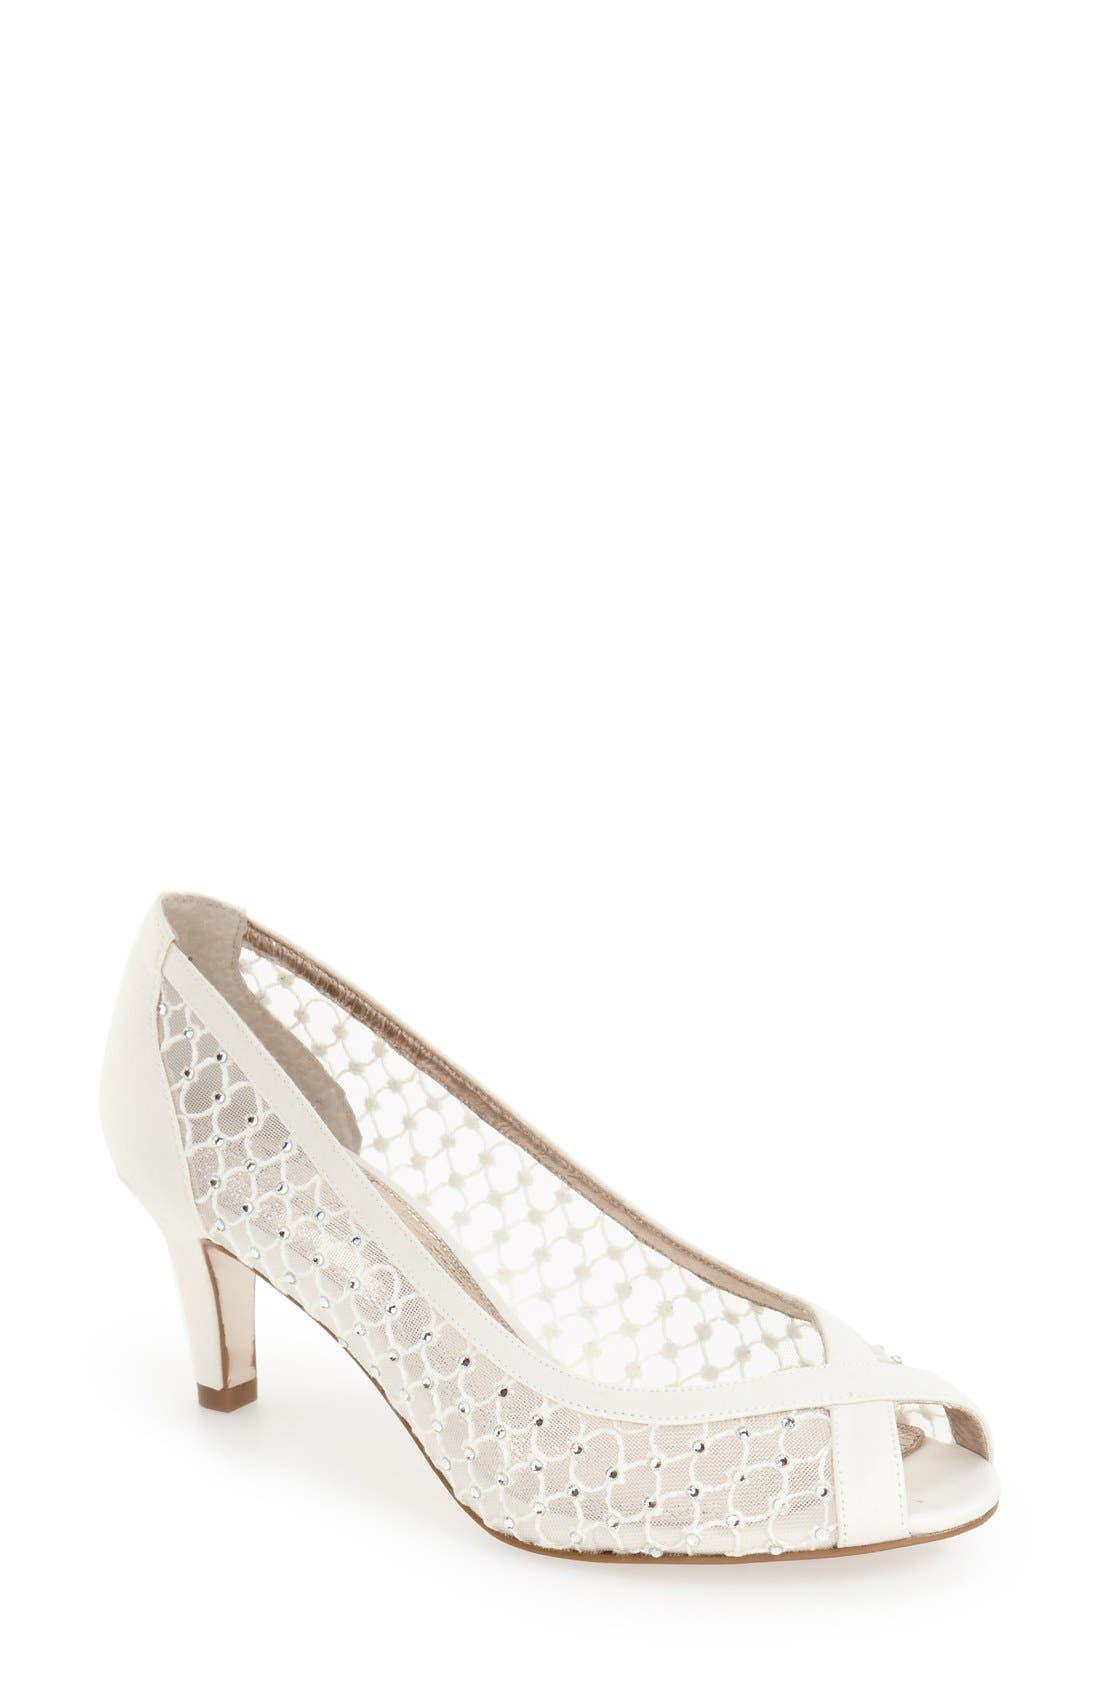 ADRIANNA PAPELL 'Zandra' Crystal Embellished Peep Toe Pump